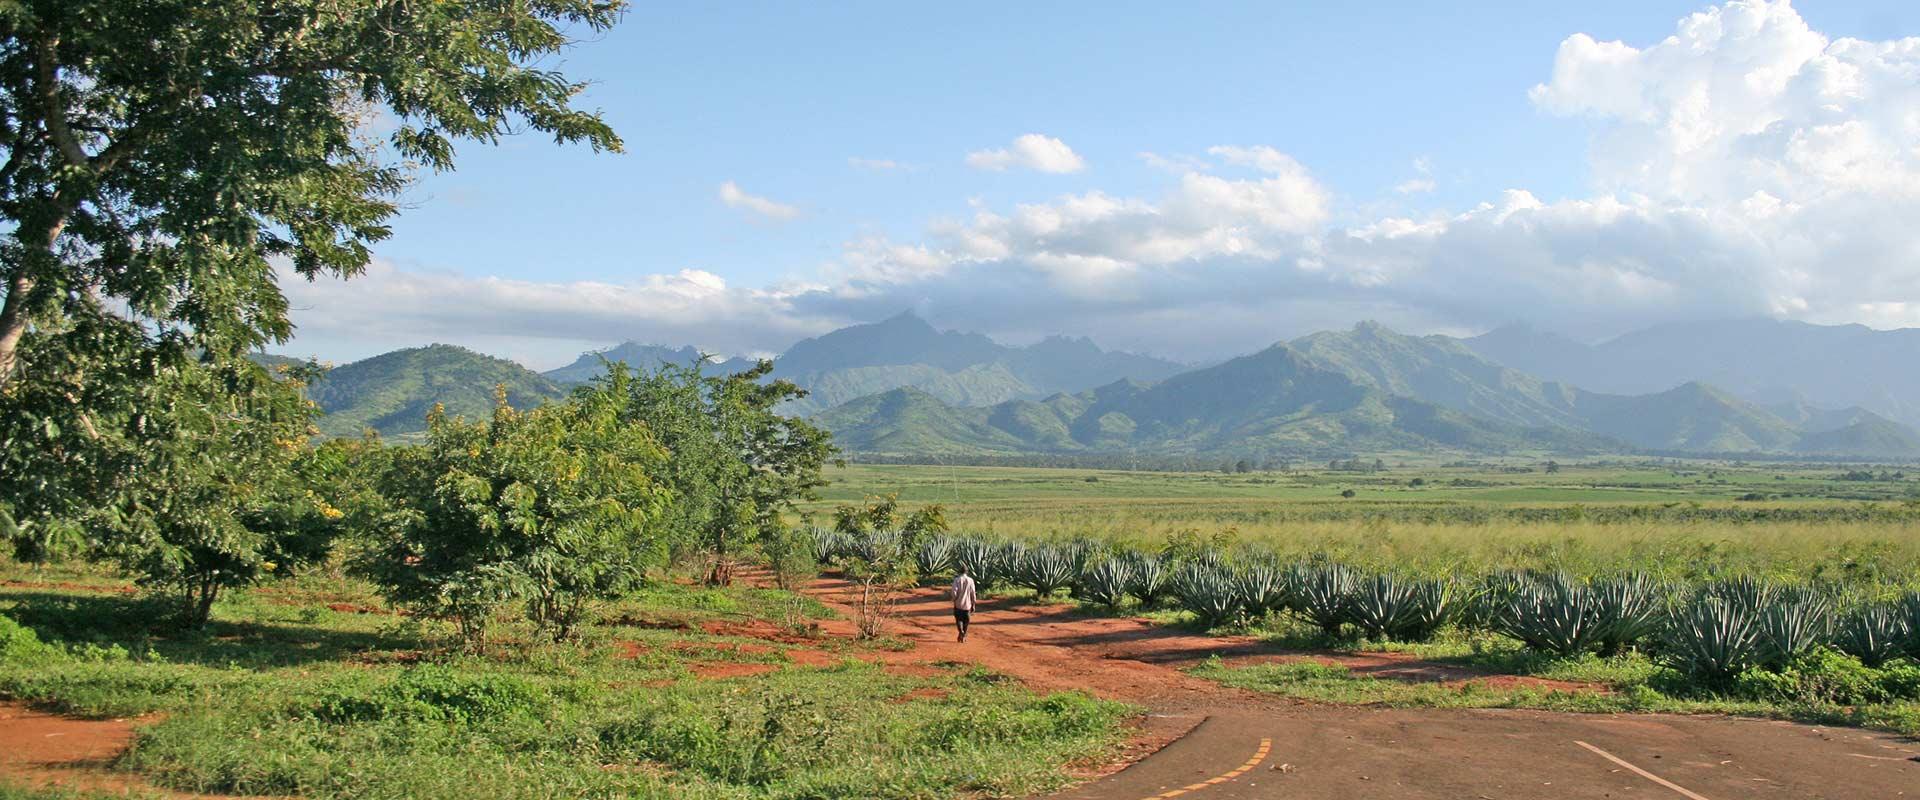 3 Day Mount Uluguru